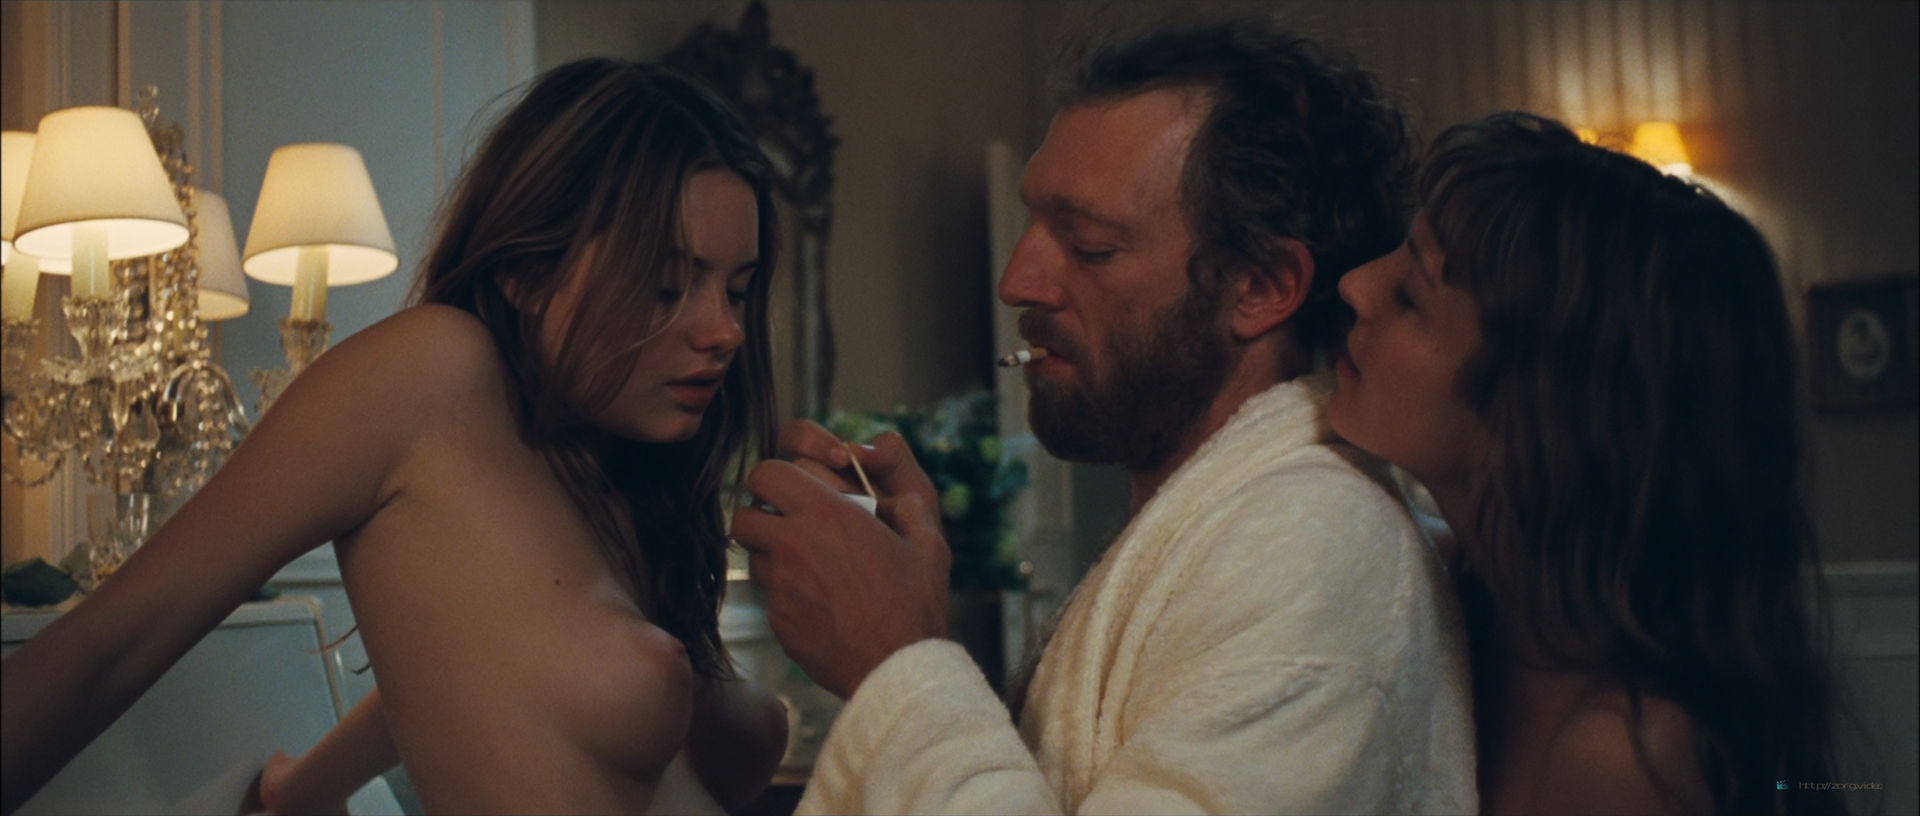 Camille Rowe nude and Josephine de La Baume nude sex threesome - Notre jour viendra (FR-2010) HD 1080p BluRay (2)